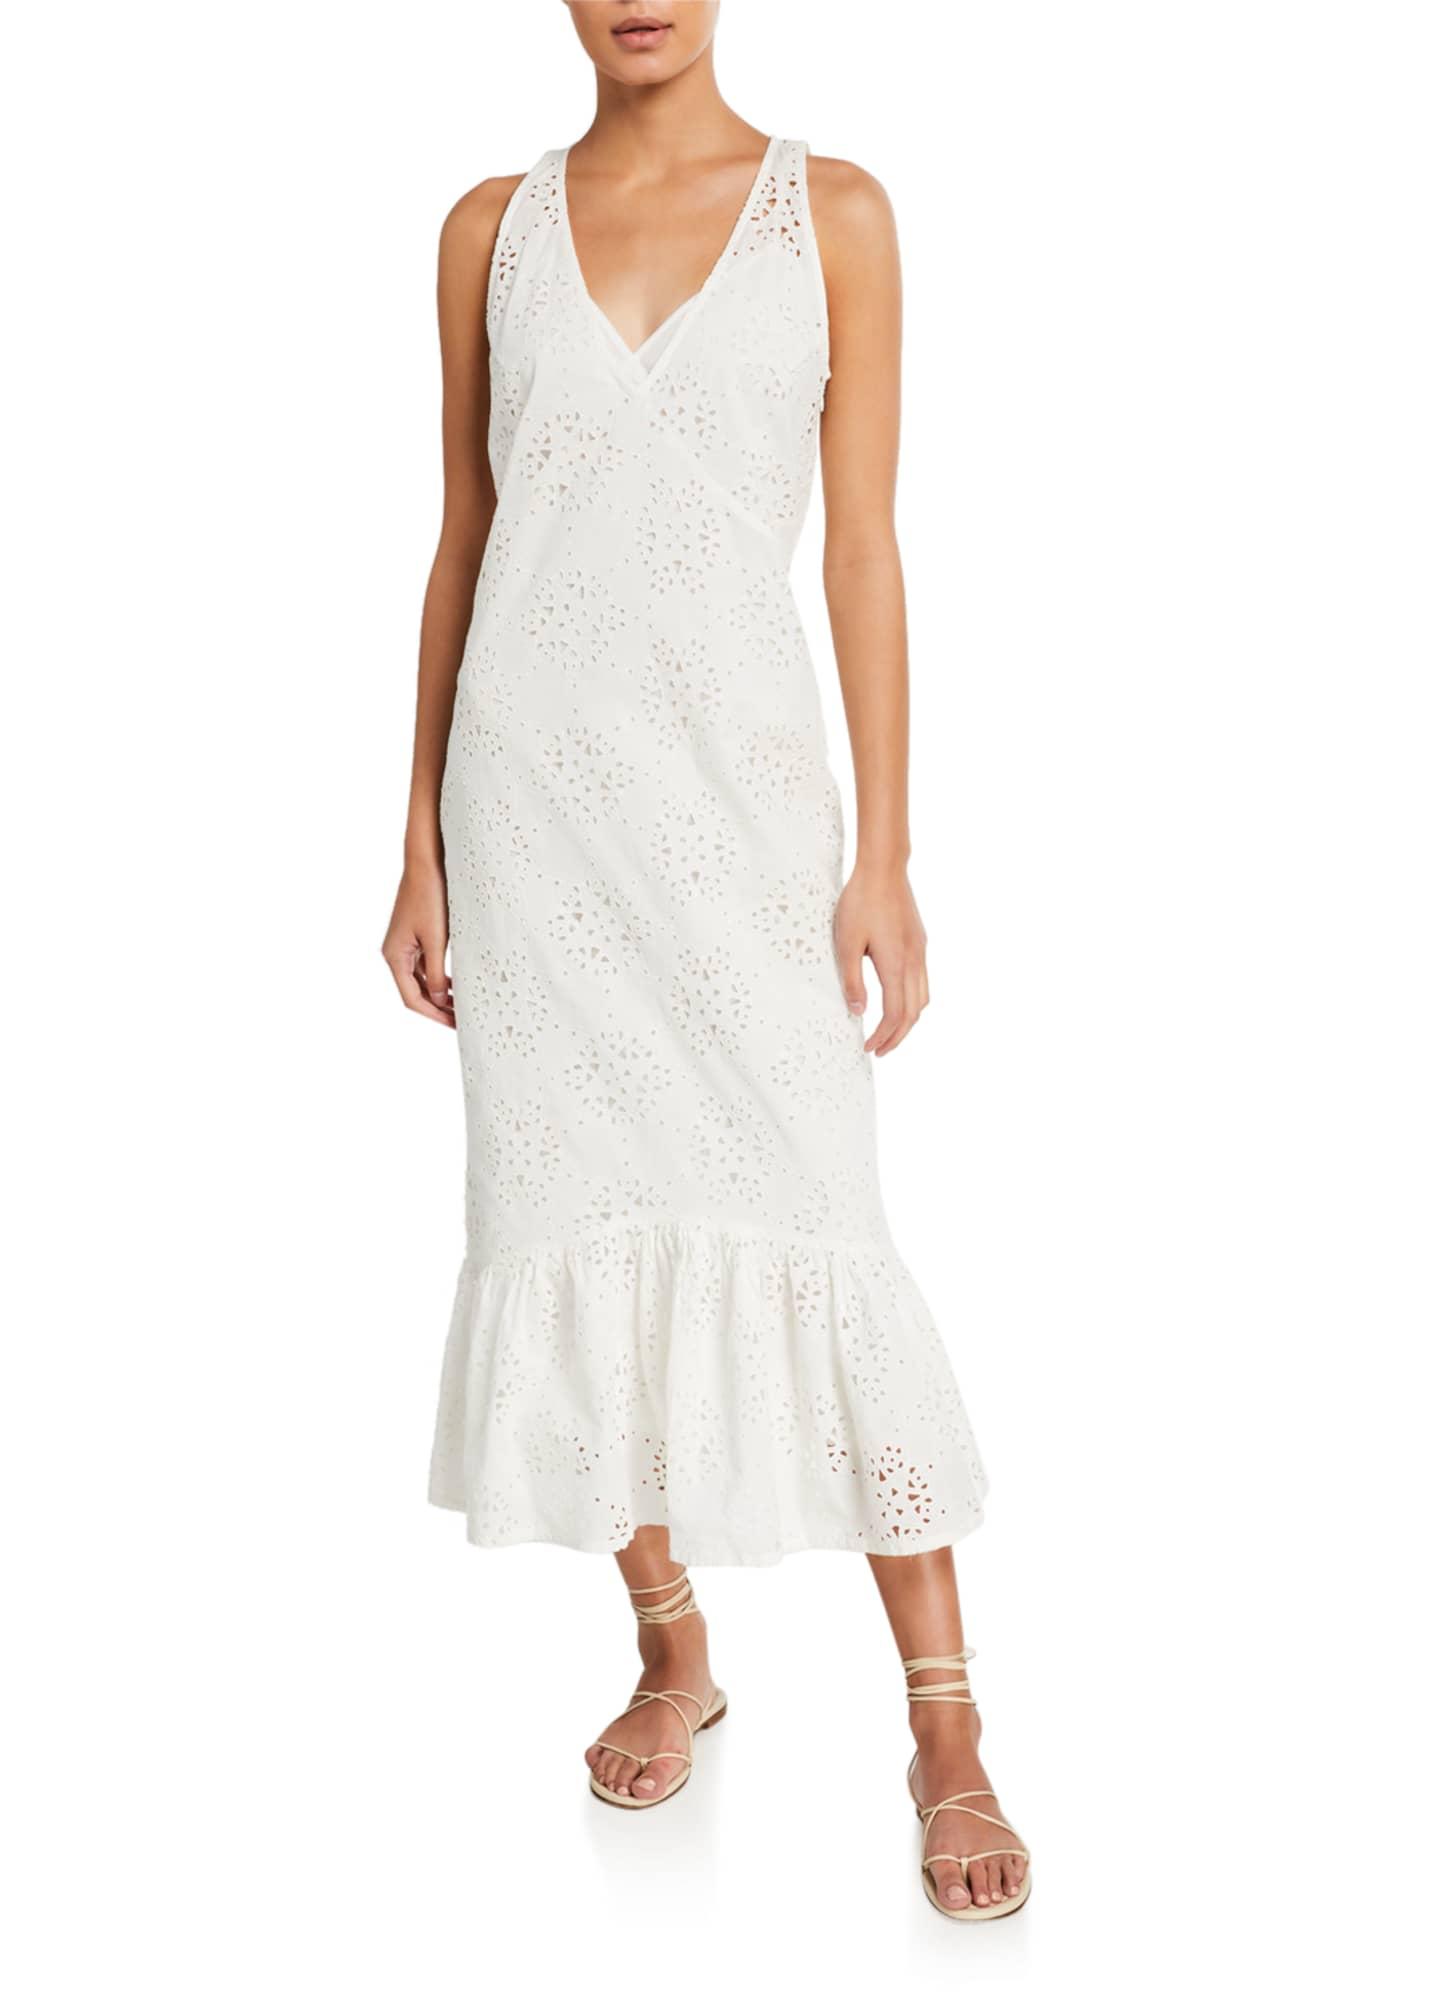 SIR The Label Celeste Flared Eyelet Midi Dress